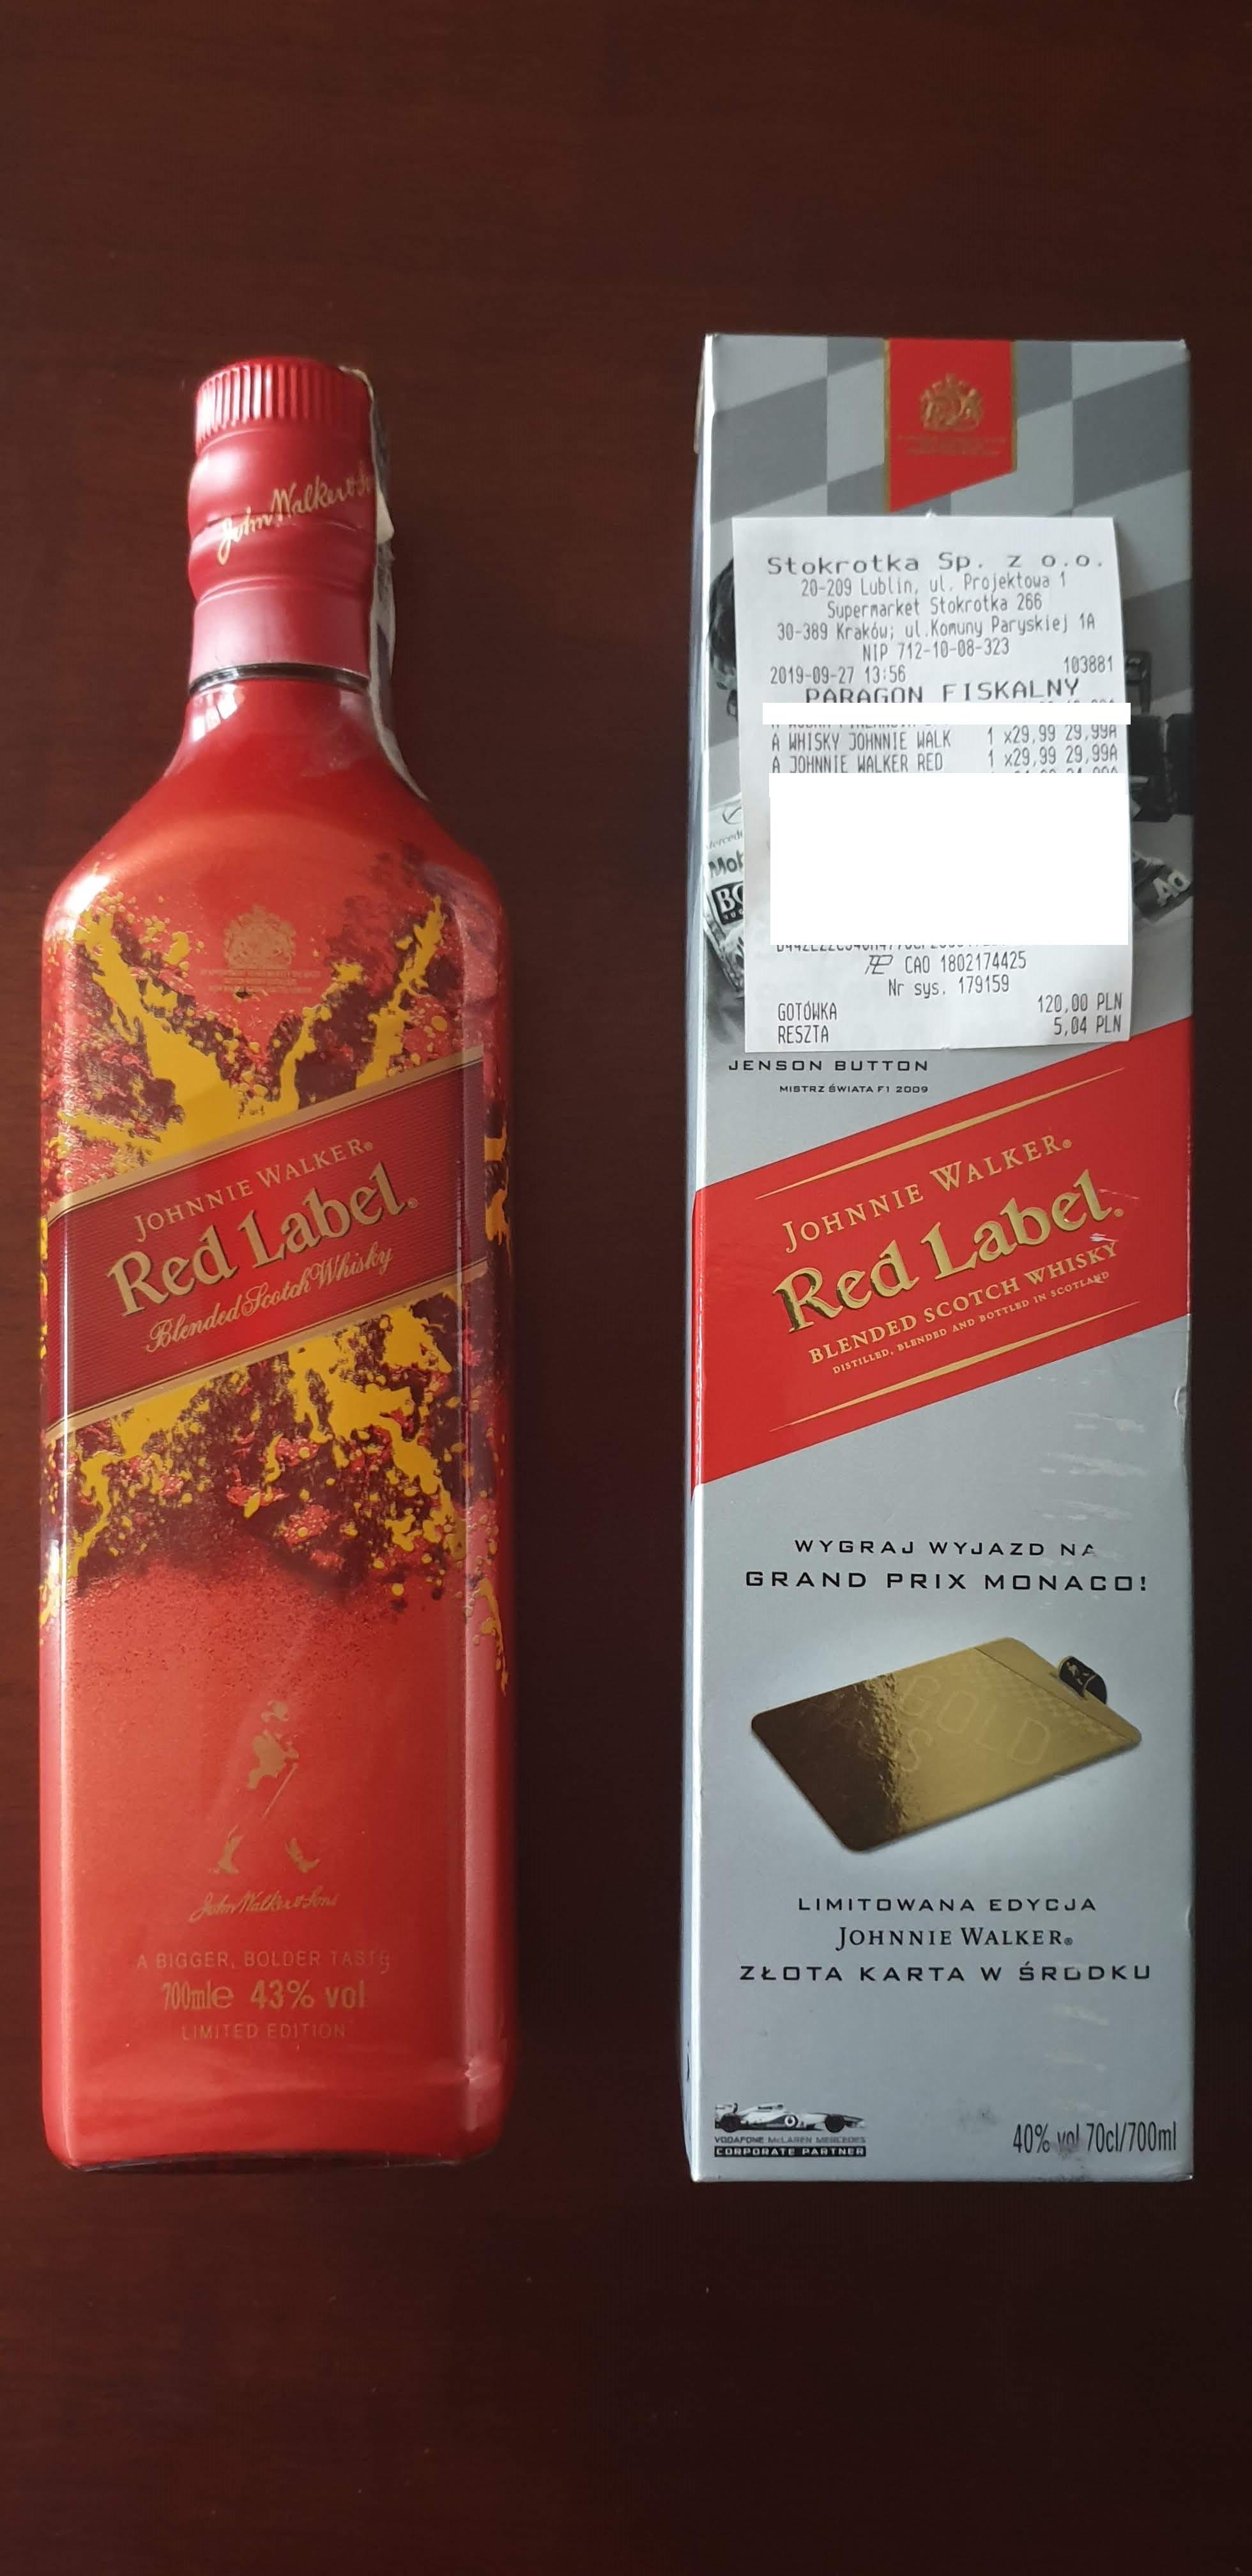 Jonnie Walker Red 0,7l i Johny Walker Red 0,7l Special Edition  29,99zł - Stokrotka